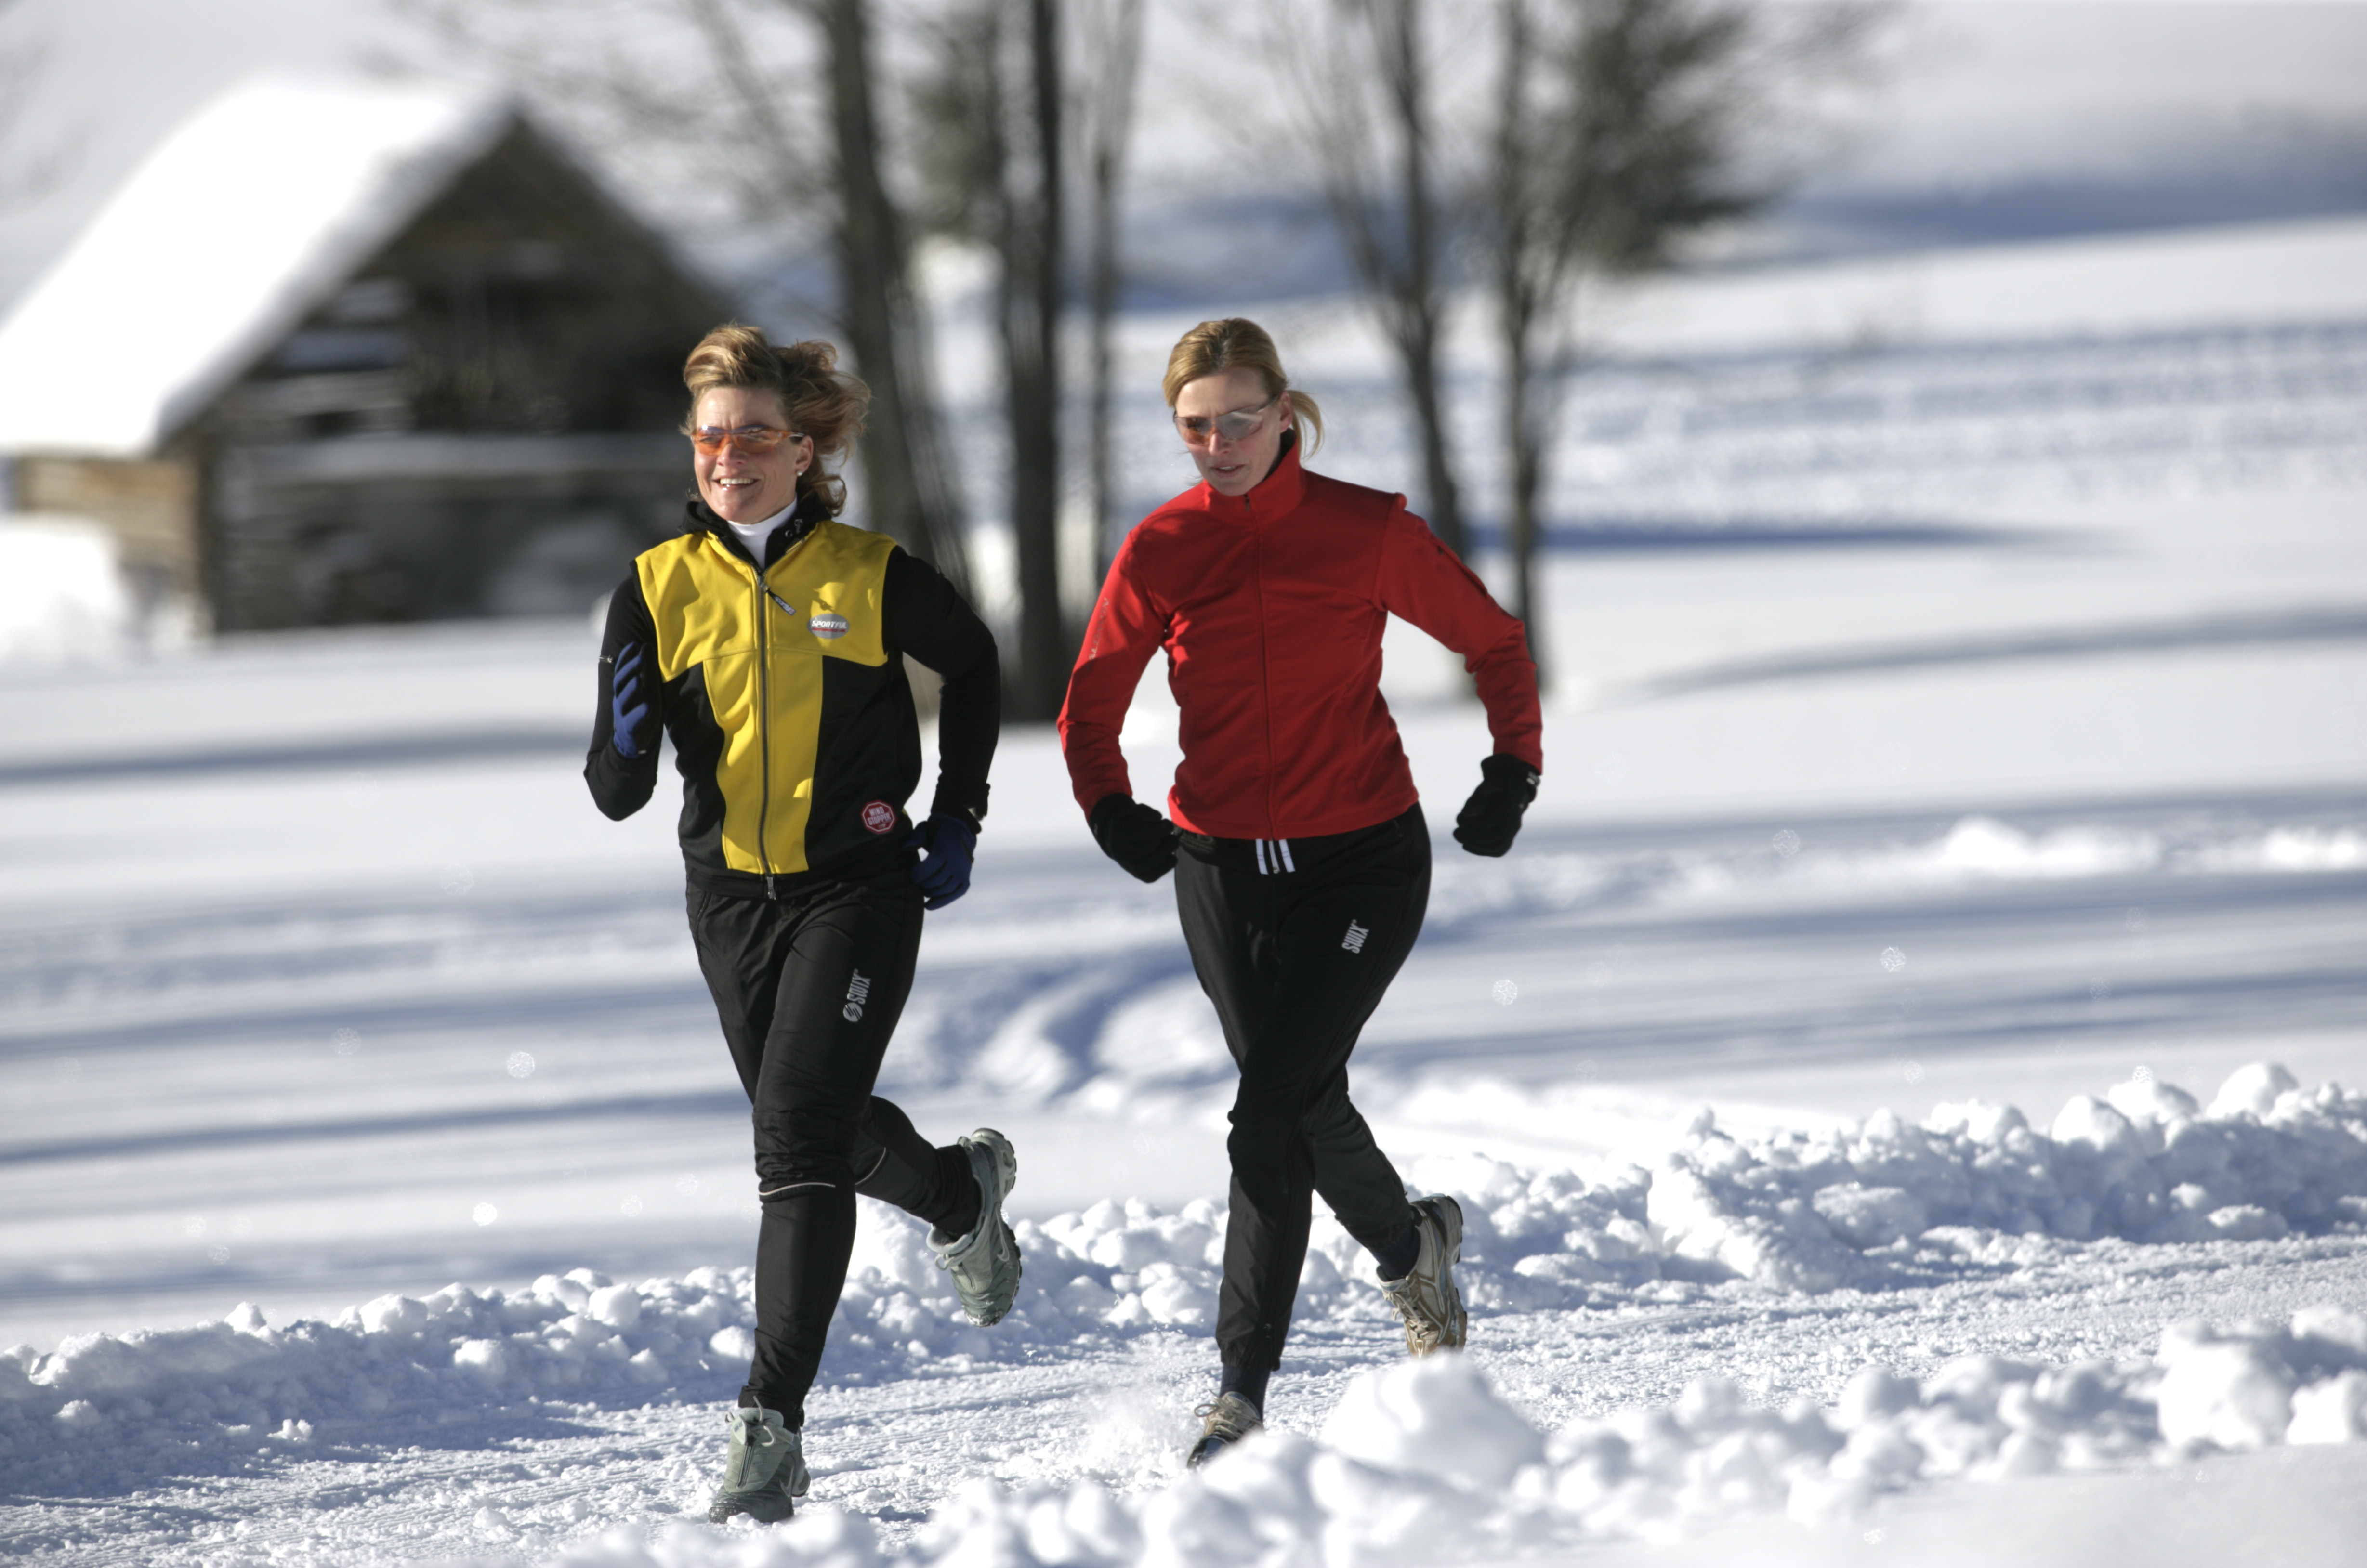 tipps zum joggen im winter evidero. Black Bedroom Furniture Sets. Home Design Ideas